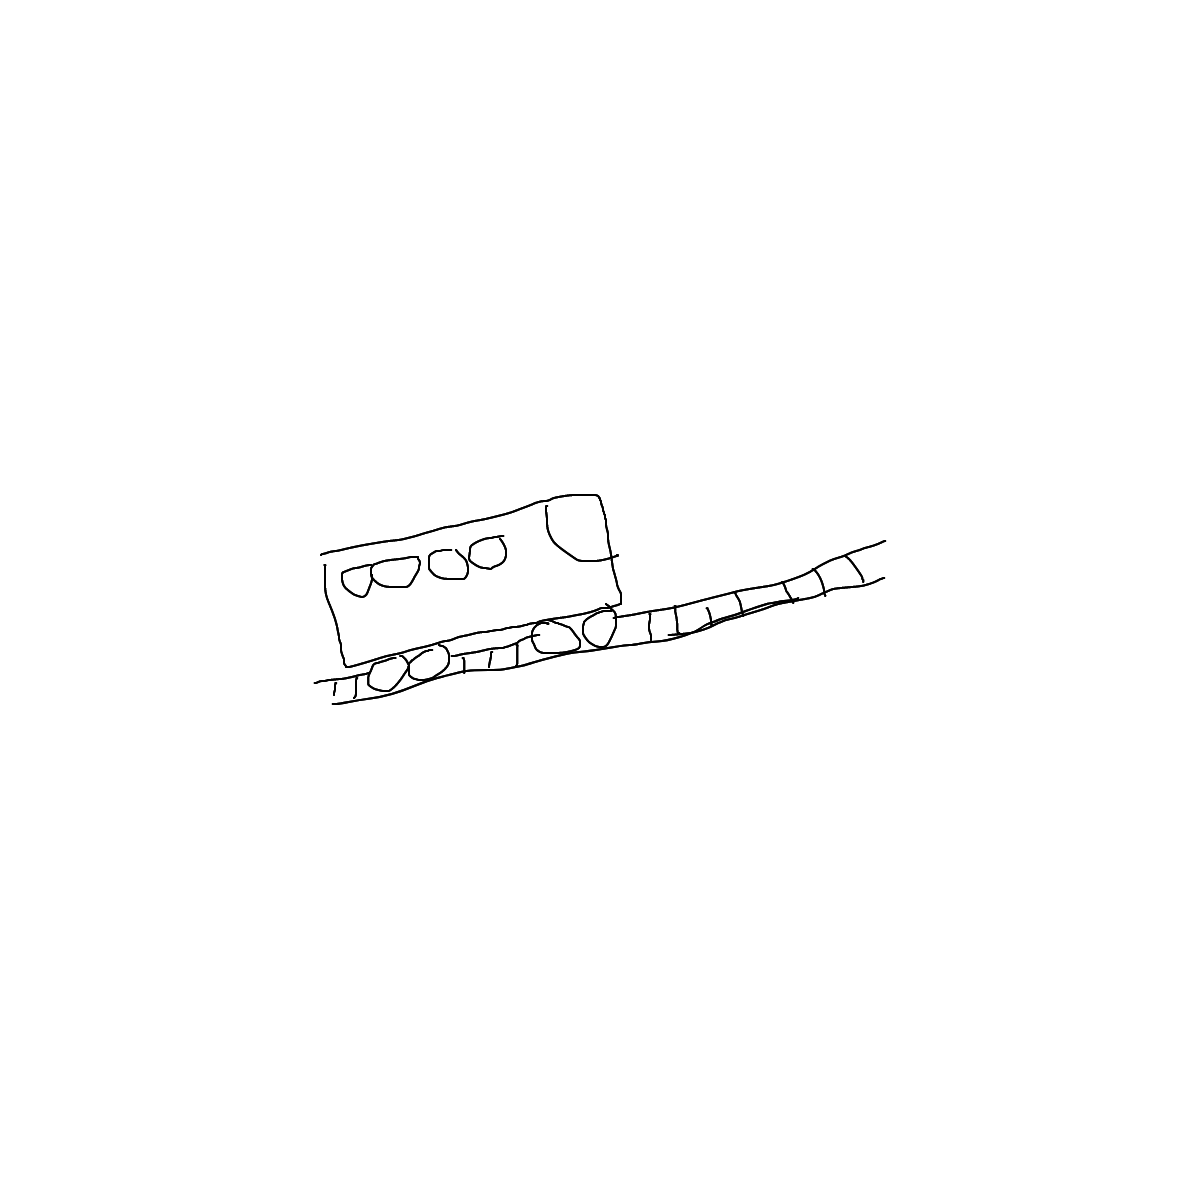 BAAAM drawing#23873 lat:61.4971504211425800lng: 23.7527236938476560